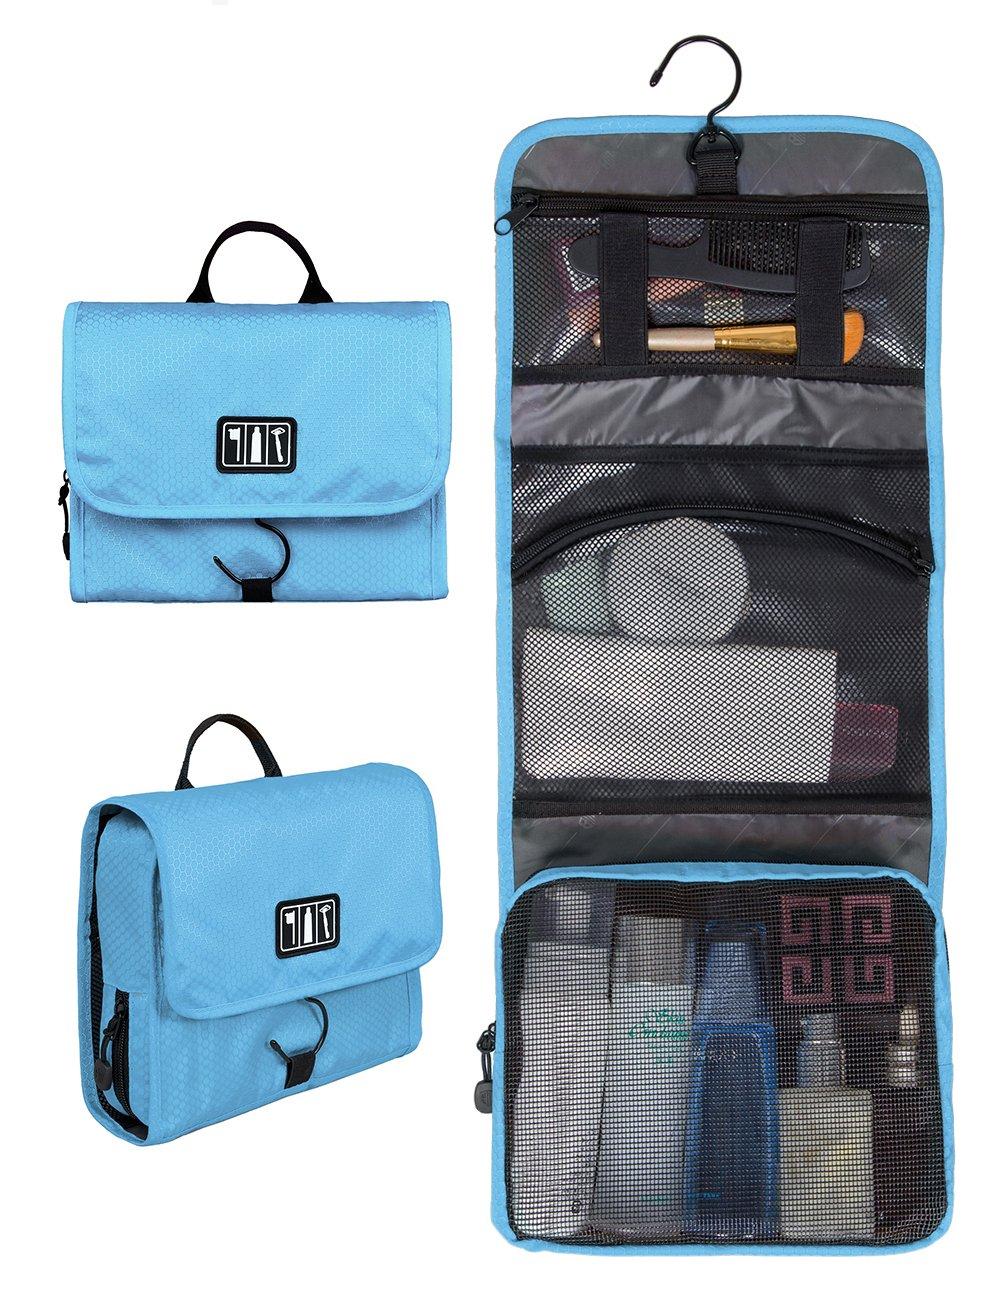 Amazon.com : BAGSMART Hanging Travel Toiletry Bag Cosmetic Carryon ...